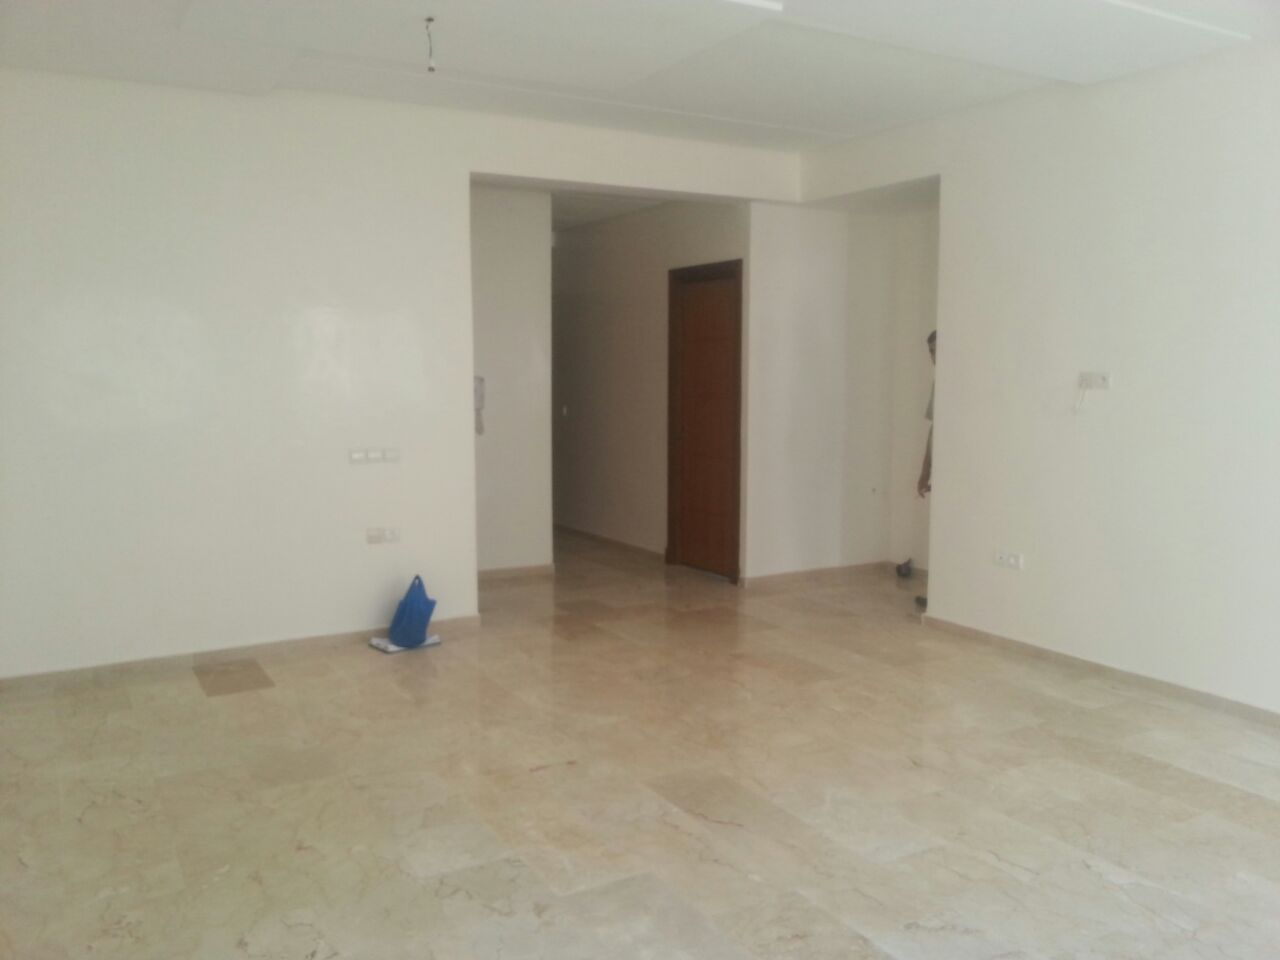 appartement avec garage vendre immobilier fes. Black Bedroom Furniture Sets. Home Design Ideas